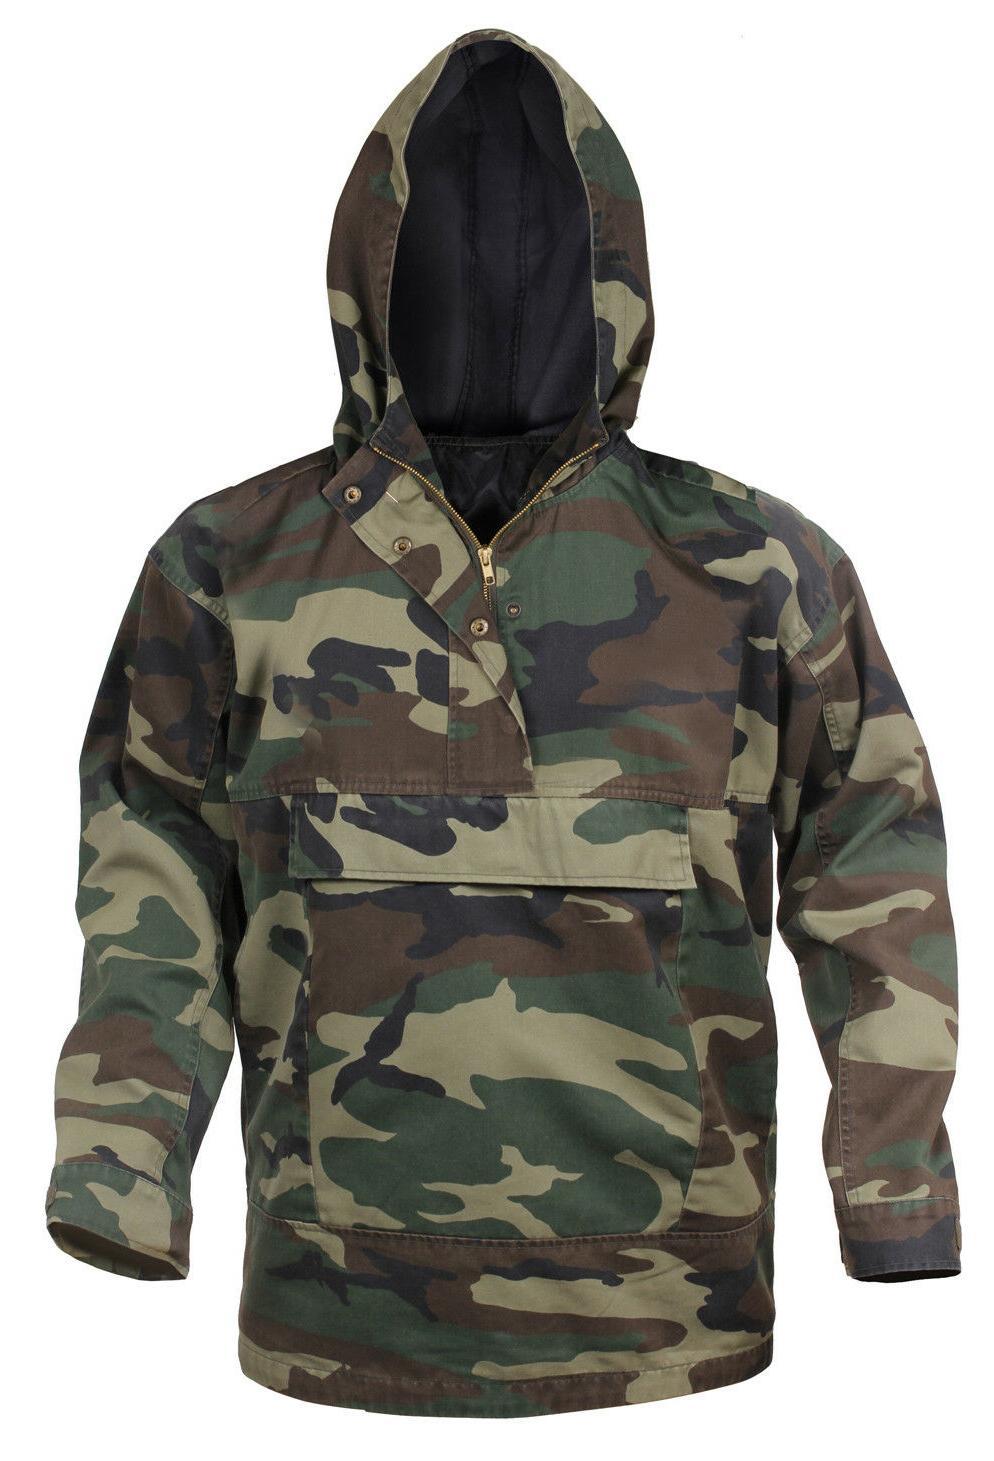 mens woodland camo anorak parka jacket coat